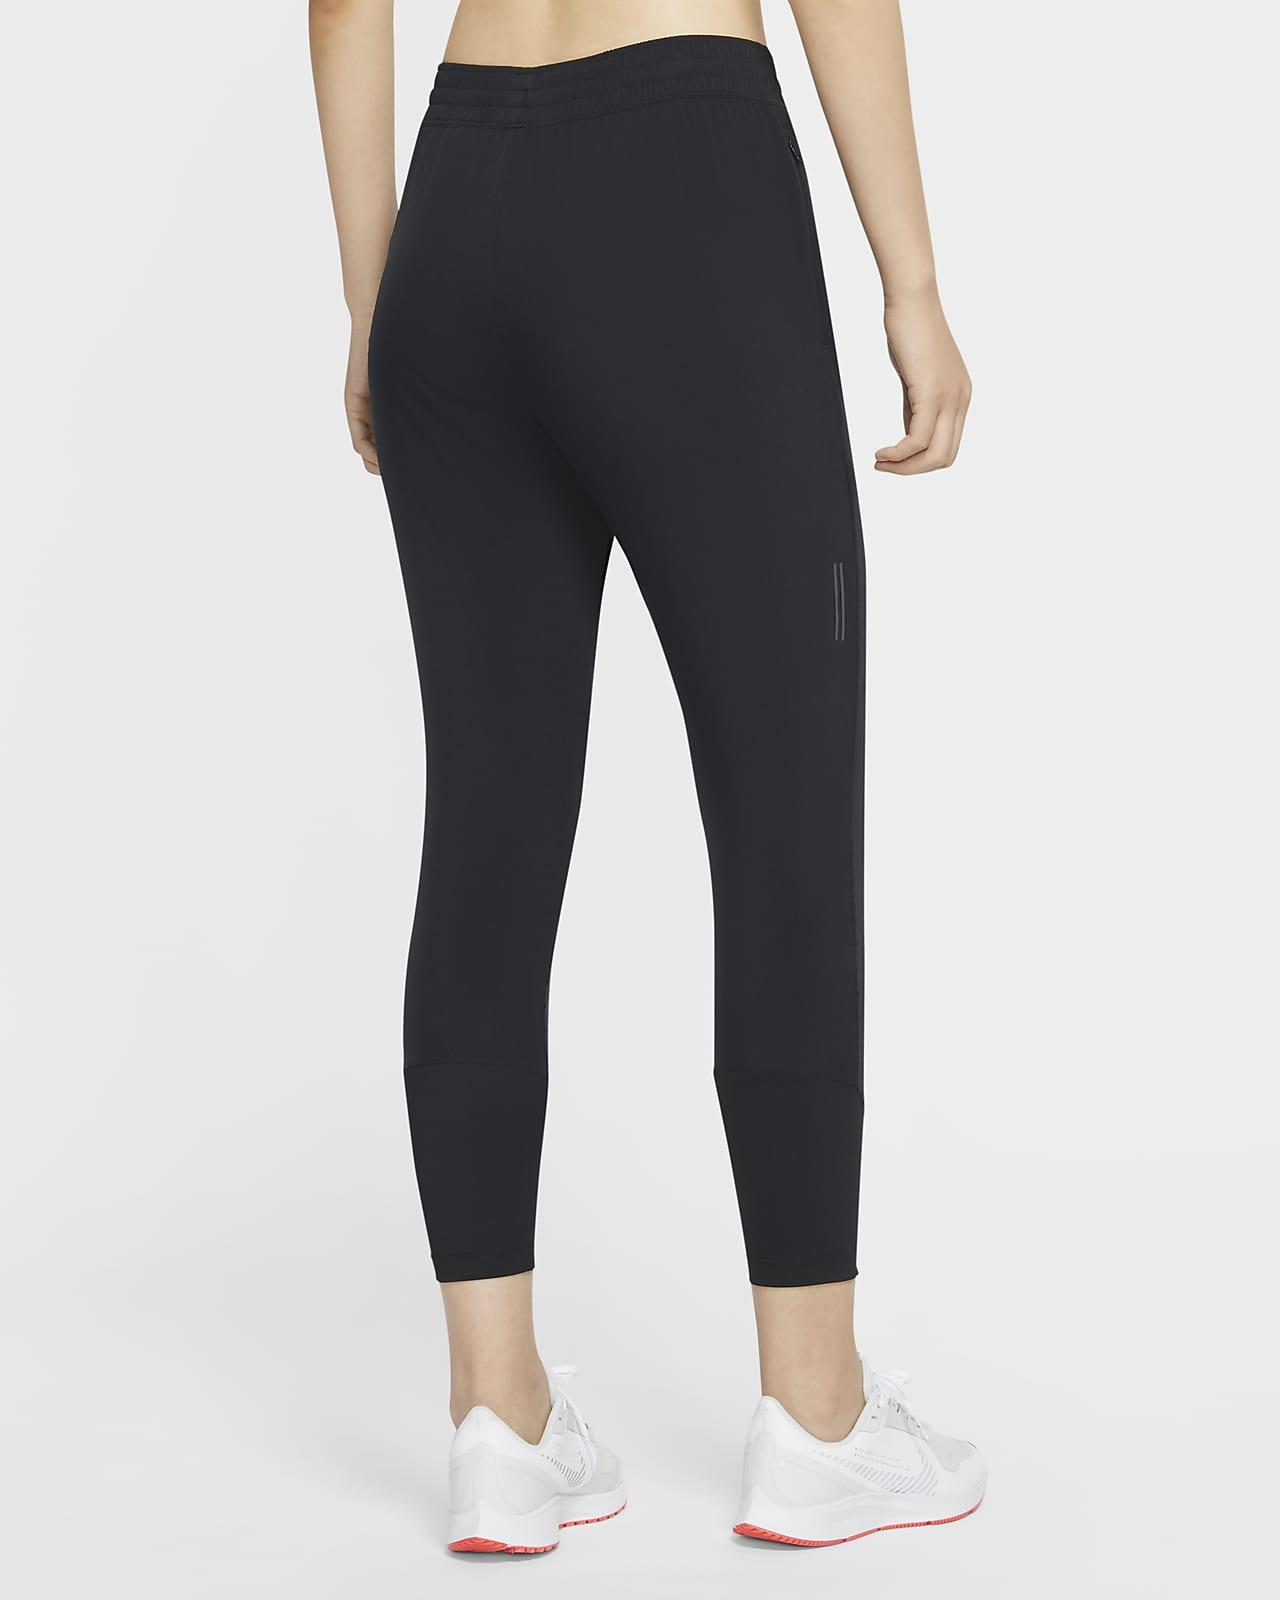 Extremo cuota de matrícula asqueroso  Pantalon de running Nike Swift pour Femme. Nike FR